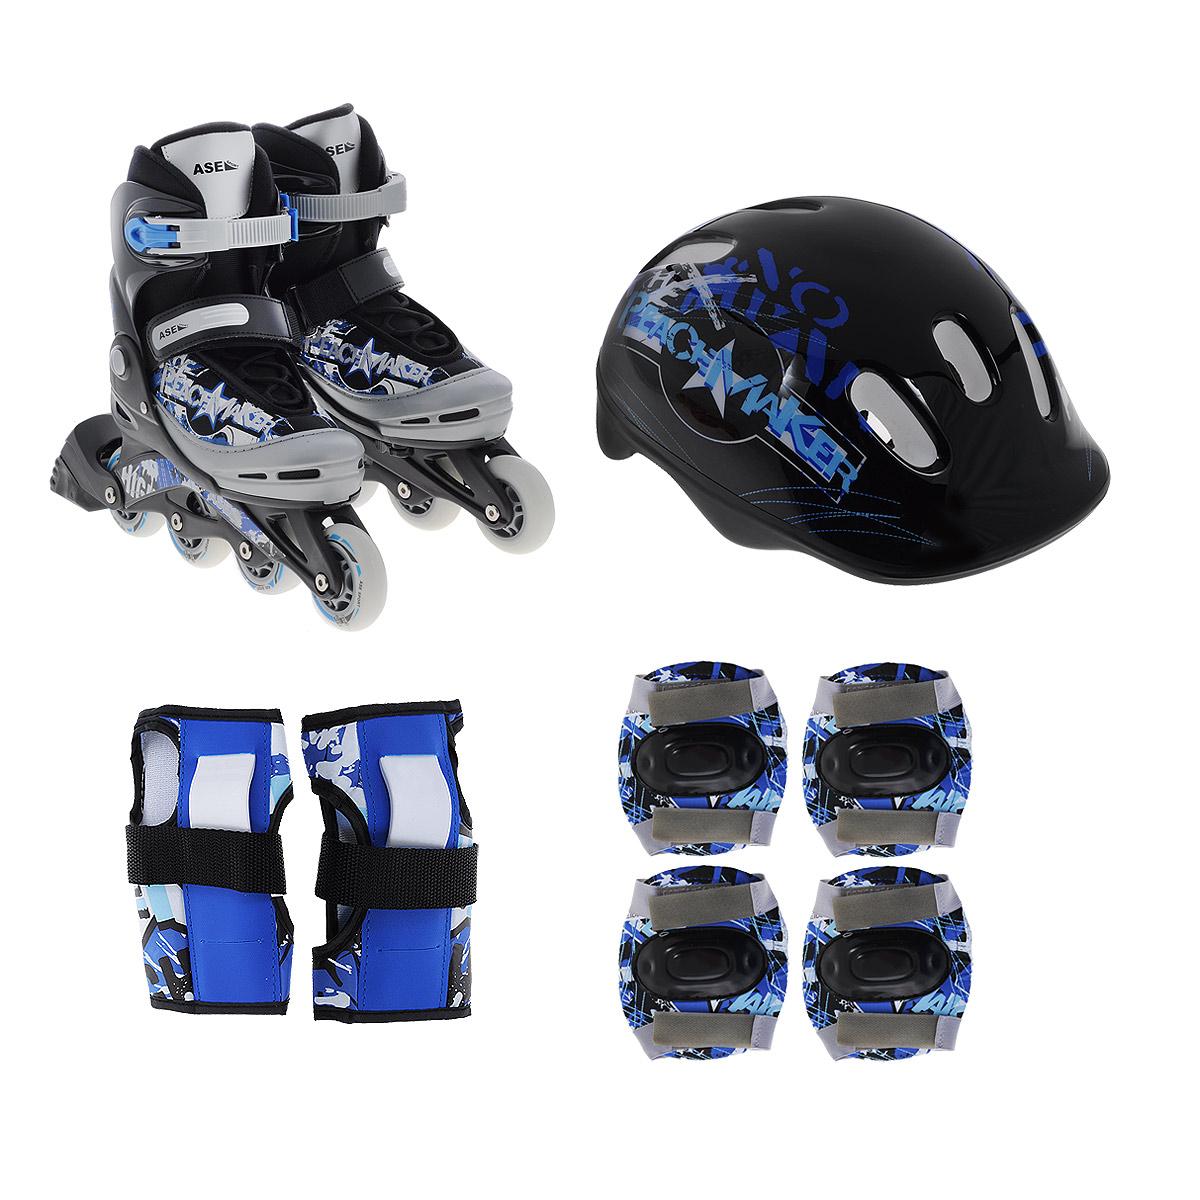 Комплект Ase-Sport Combo: коньки роликовые, шлем, защита, цвет: синий. ASE-617M. Размер XS (26/29) COMBO ASE-617M